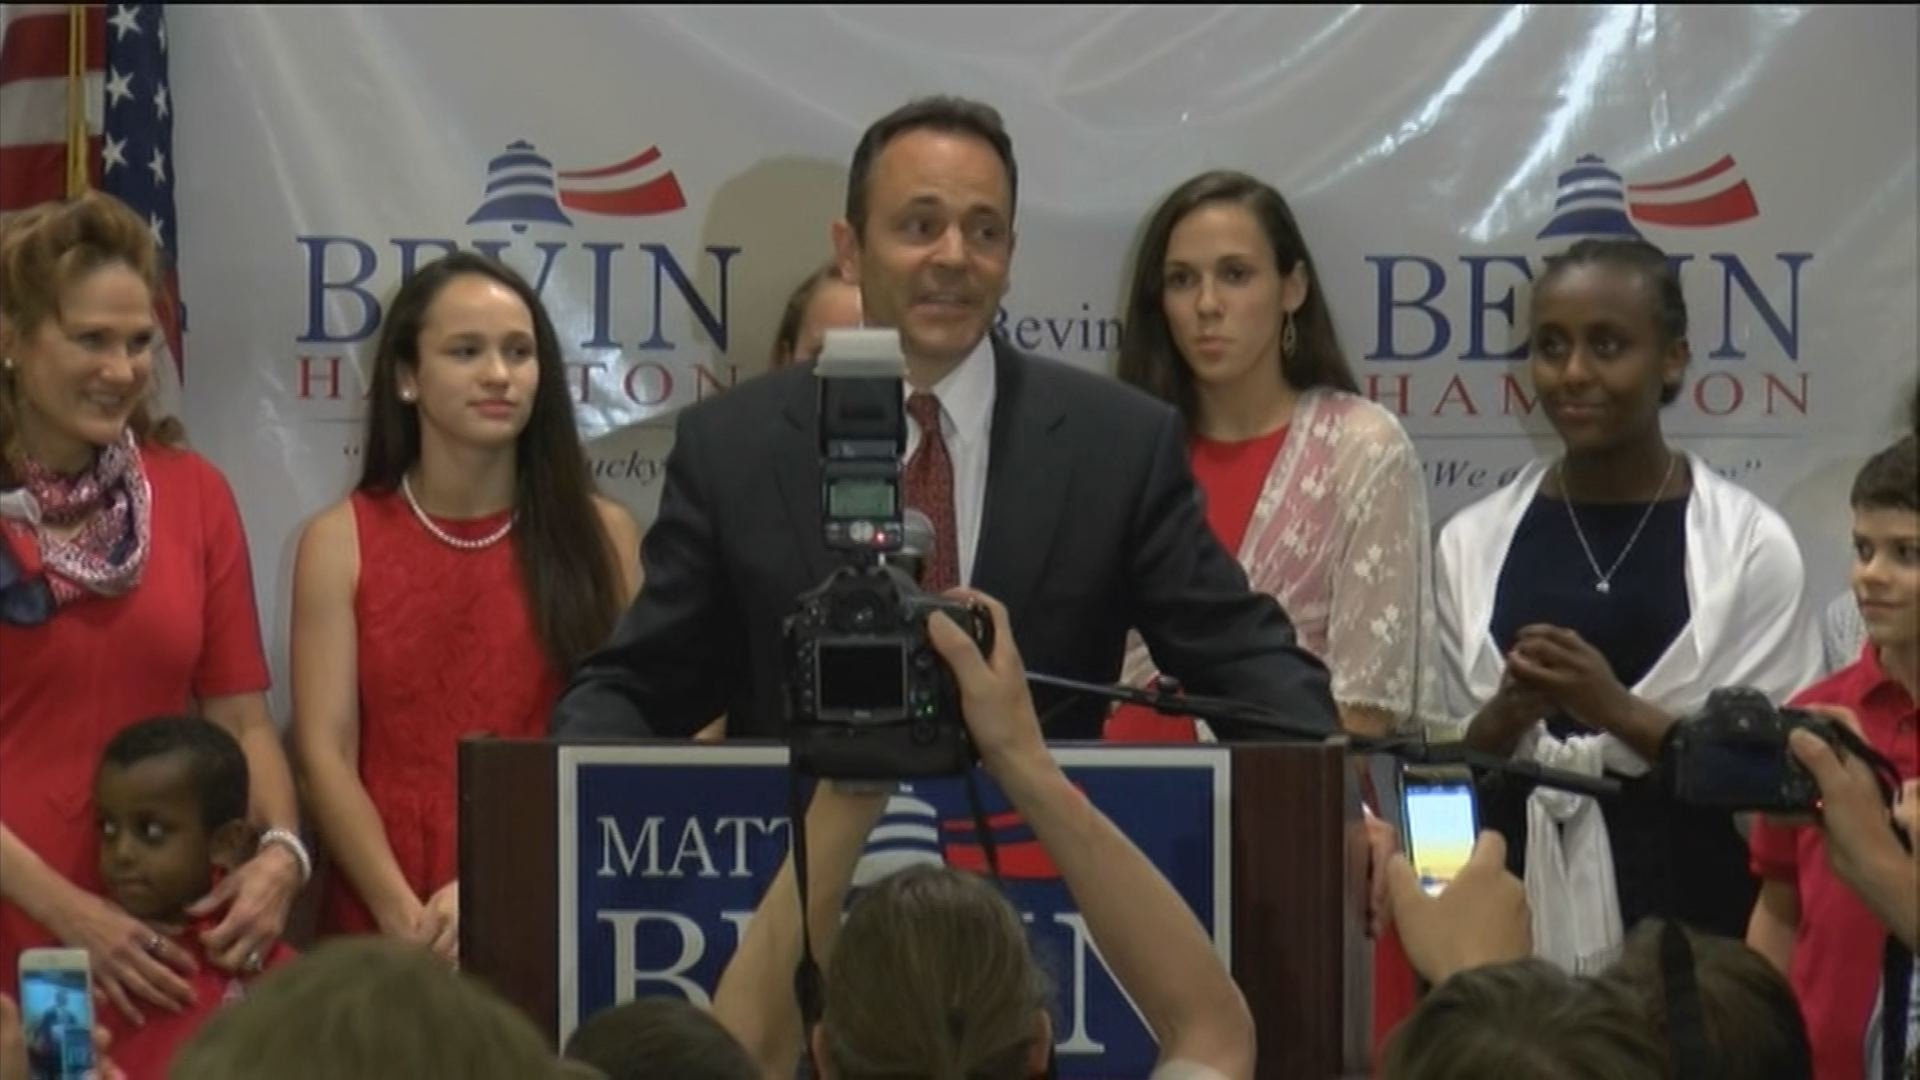 Matt Bevin addresses supporters the night of the 2015 Kentucky GOP gubernatorial primary.